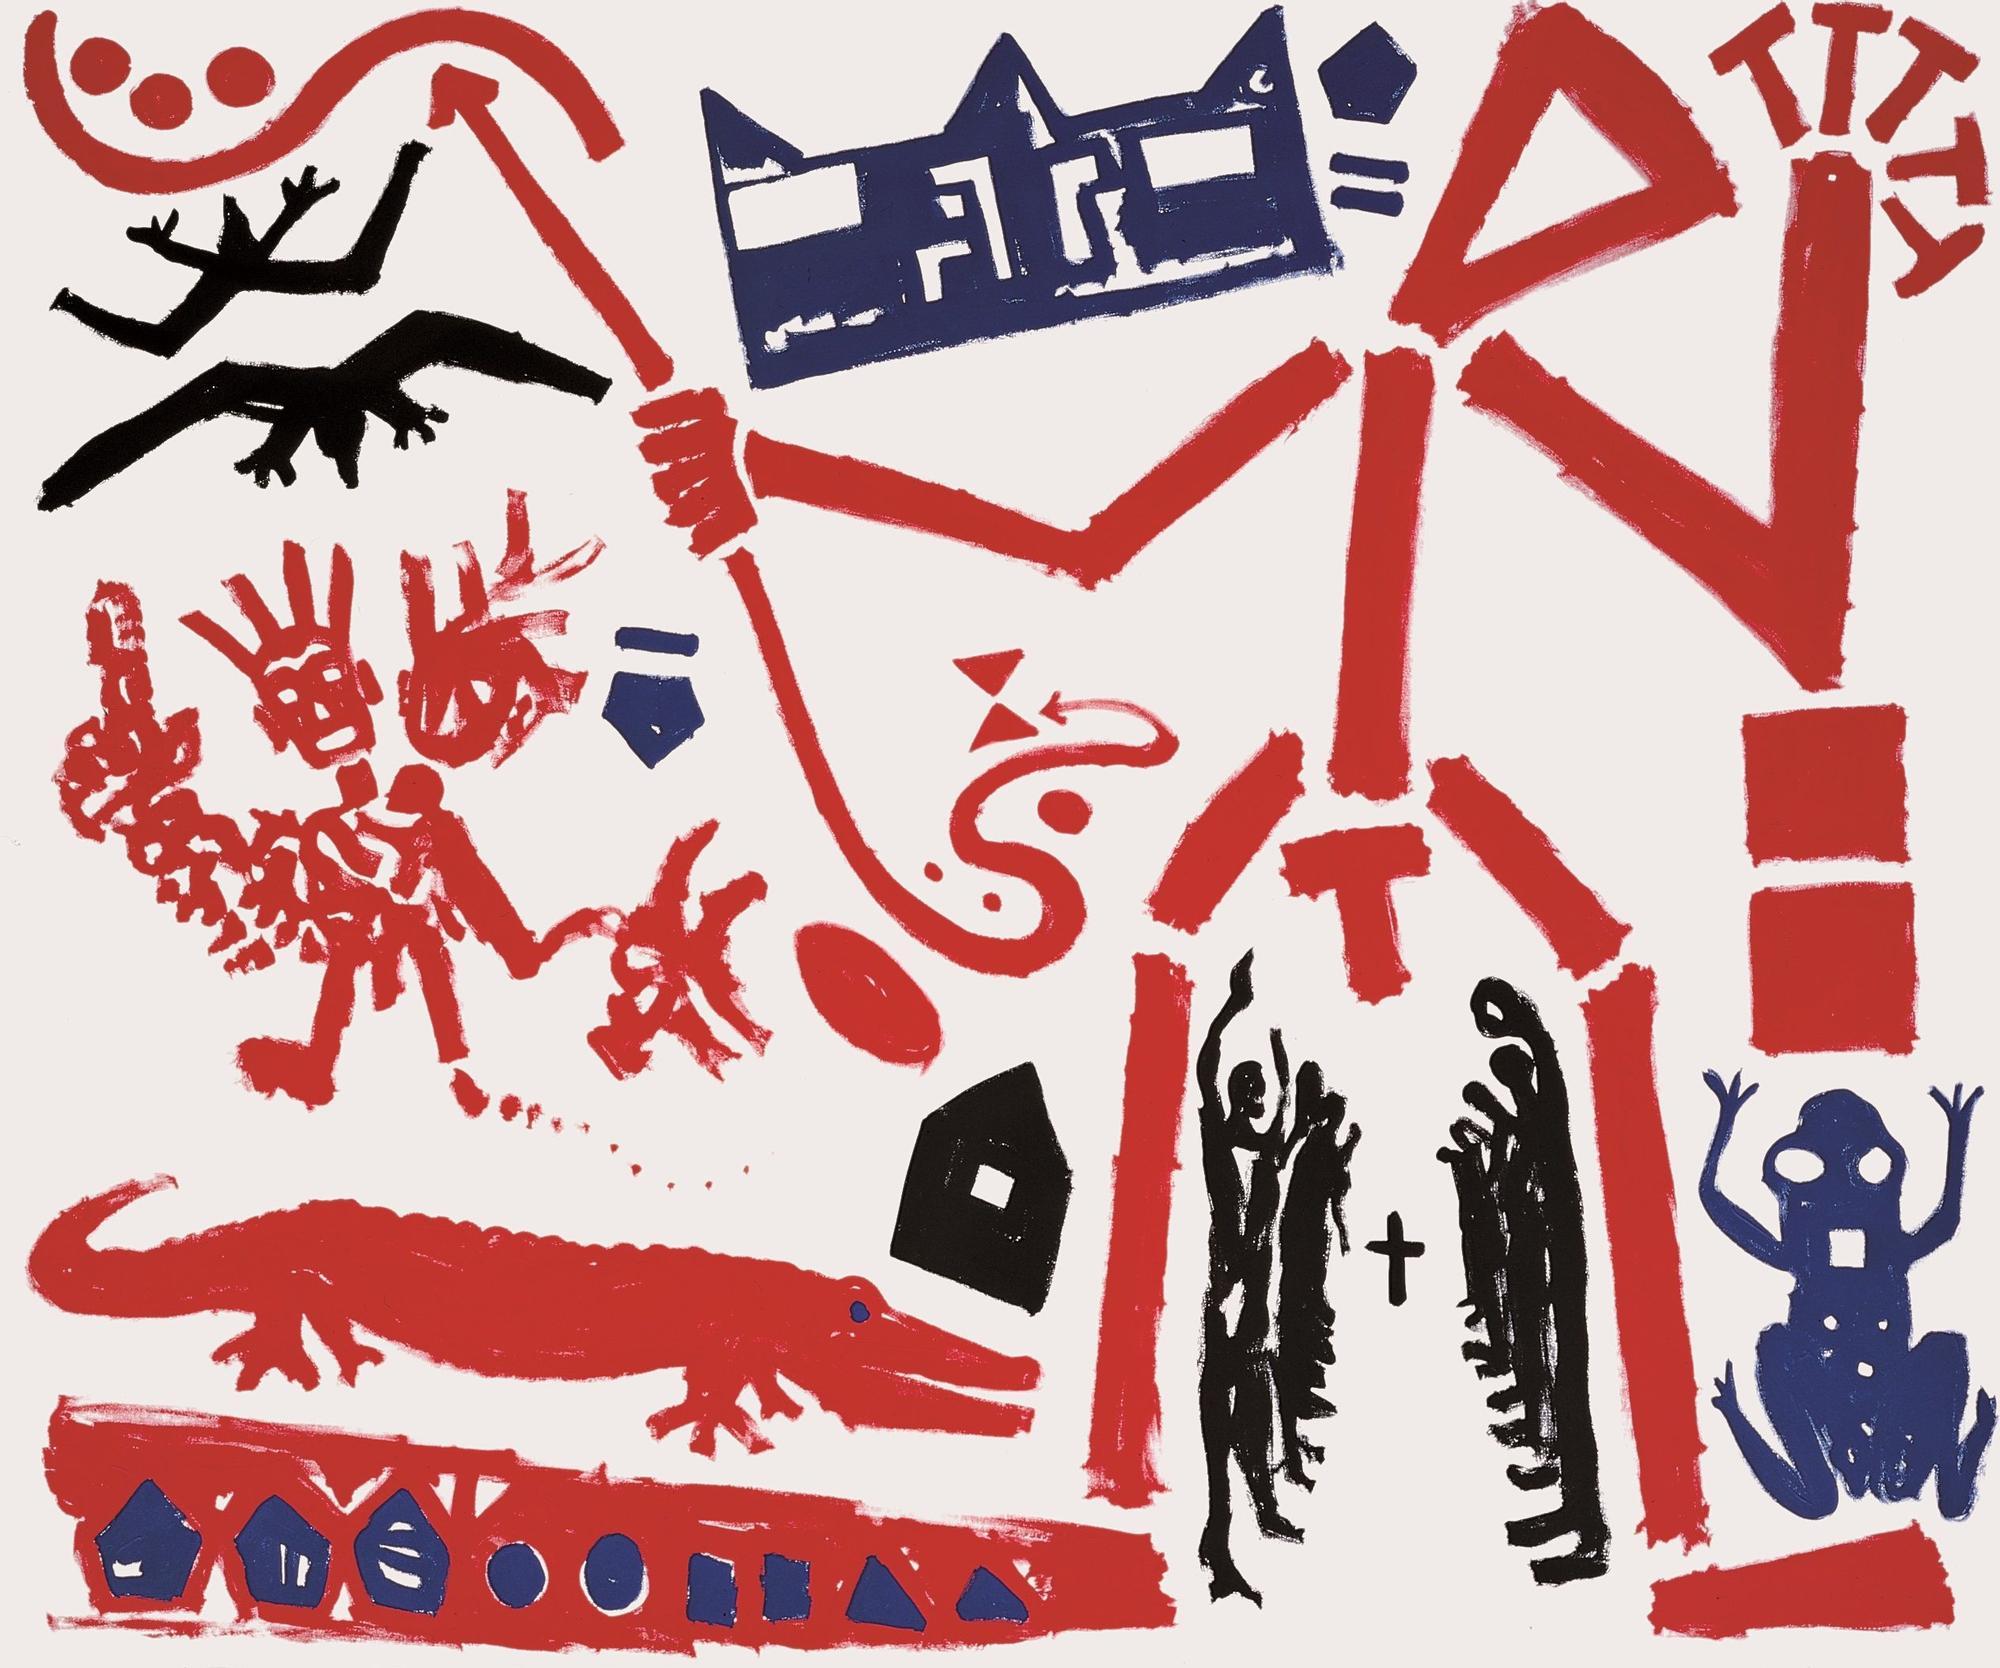 Imagen nº 6_A.R. Penck.jpg